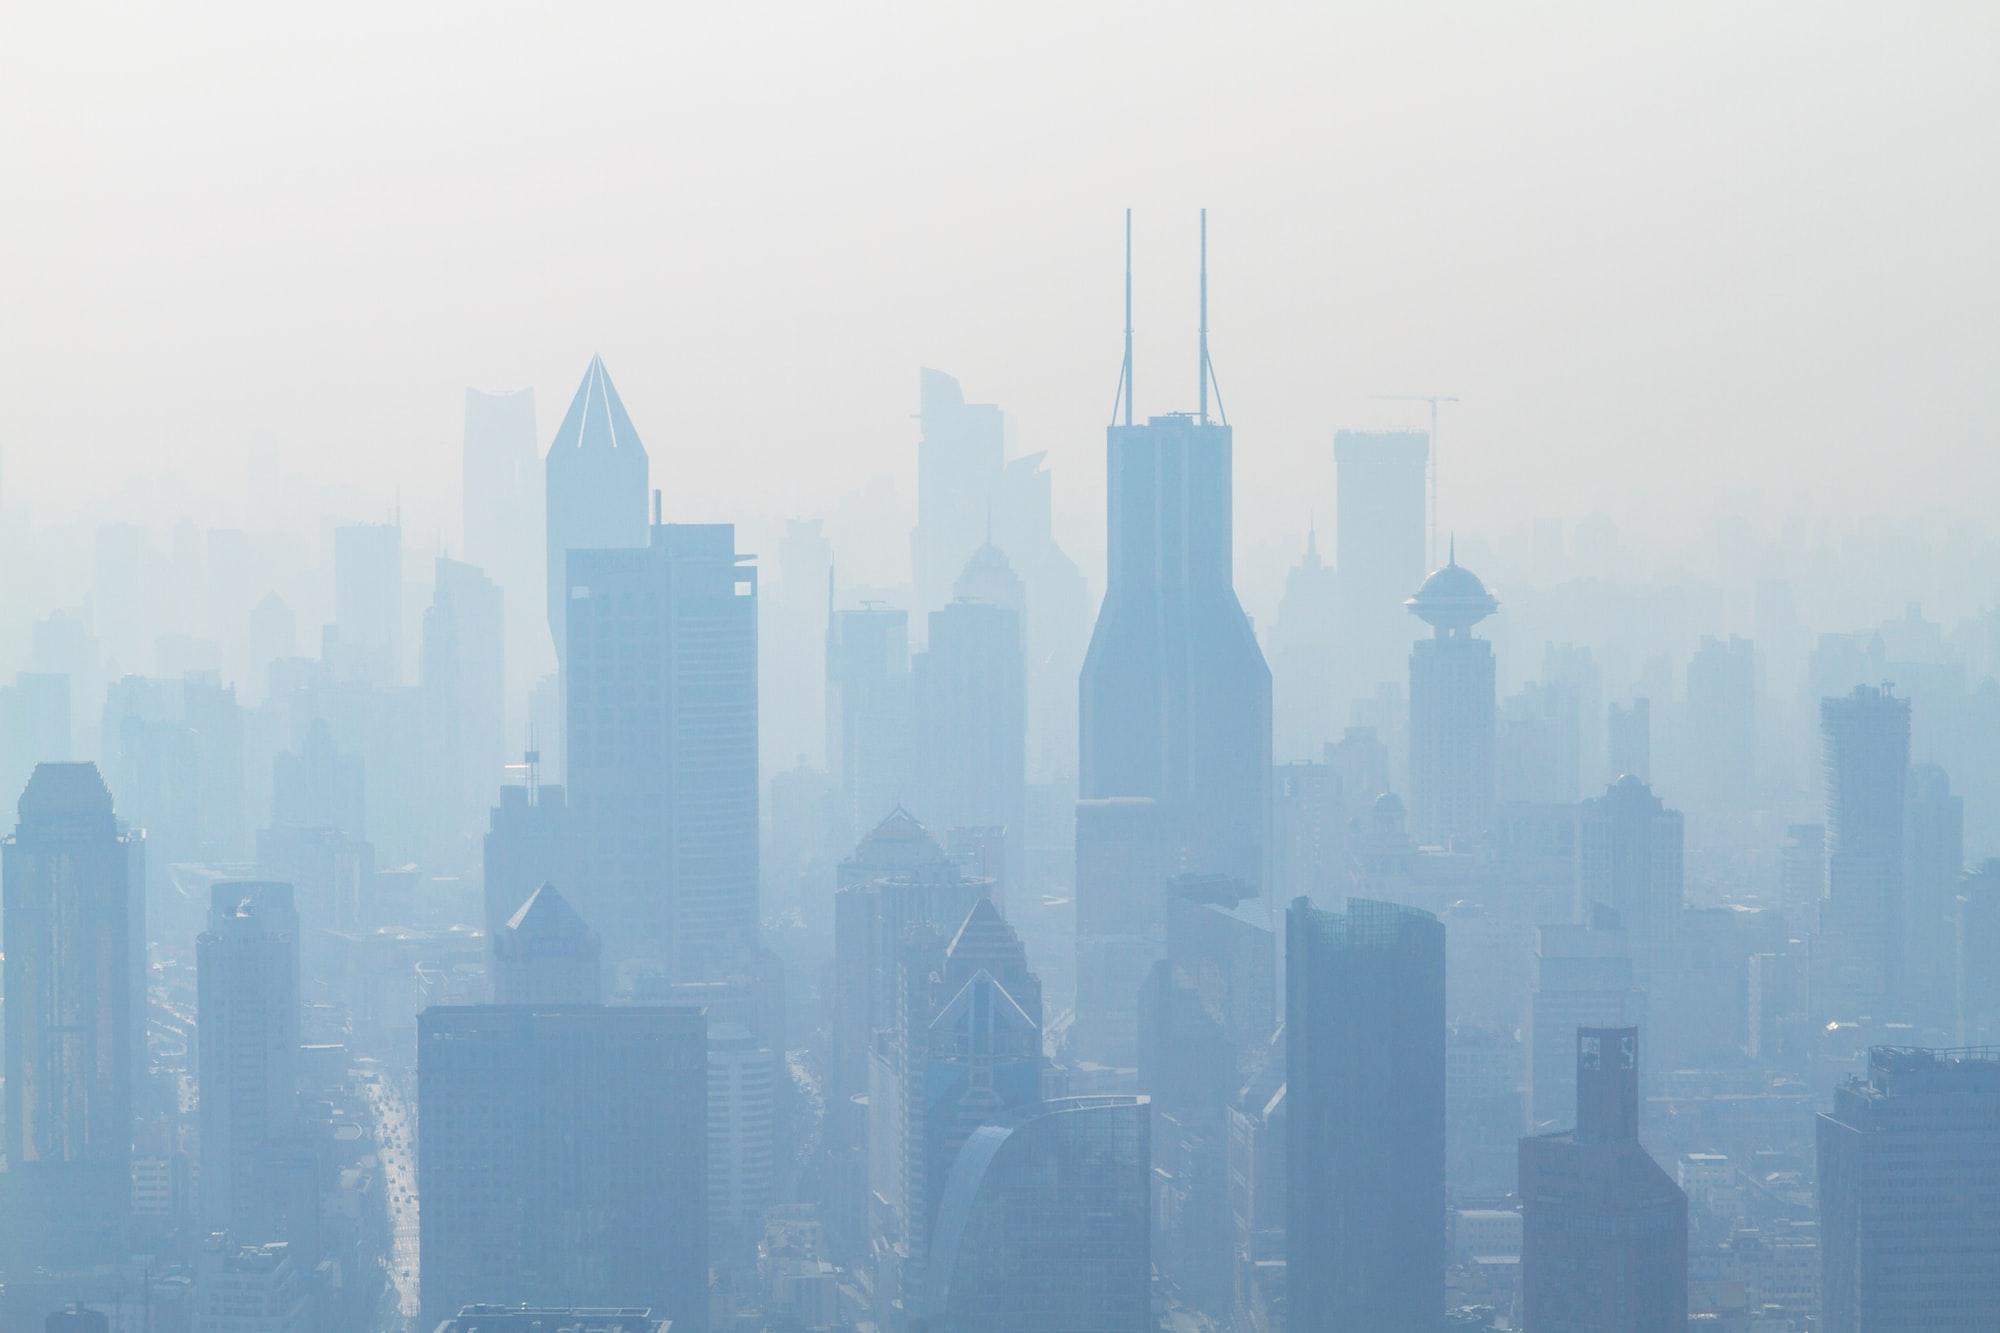 Autocracy and Environmental Degradation